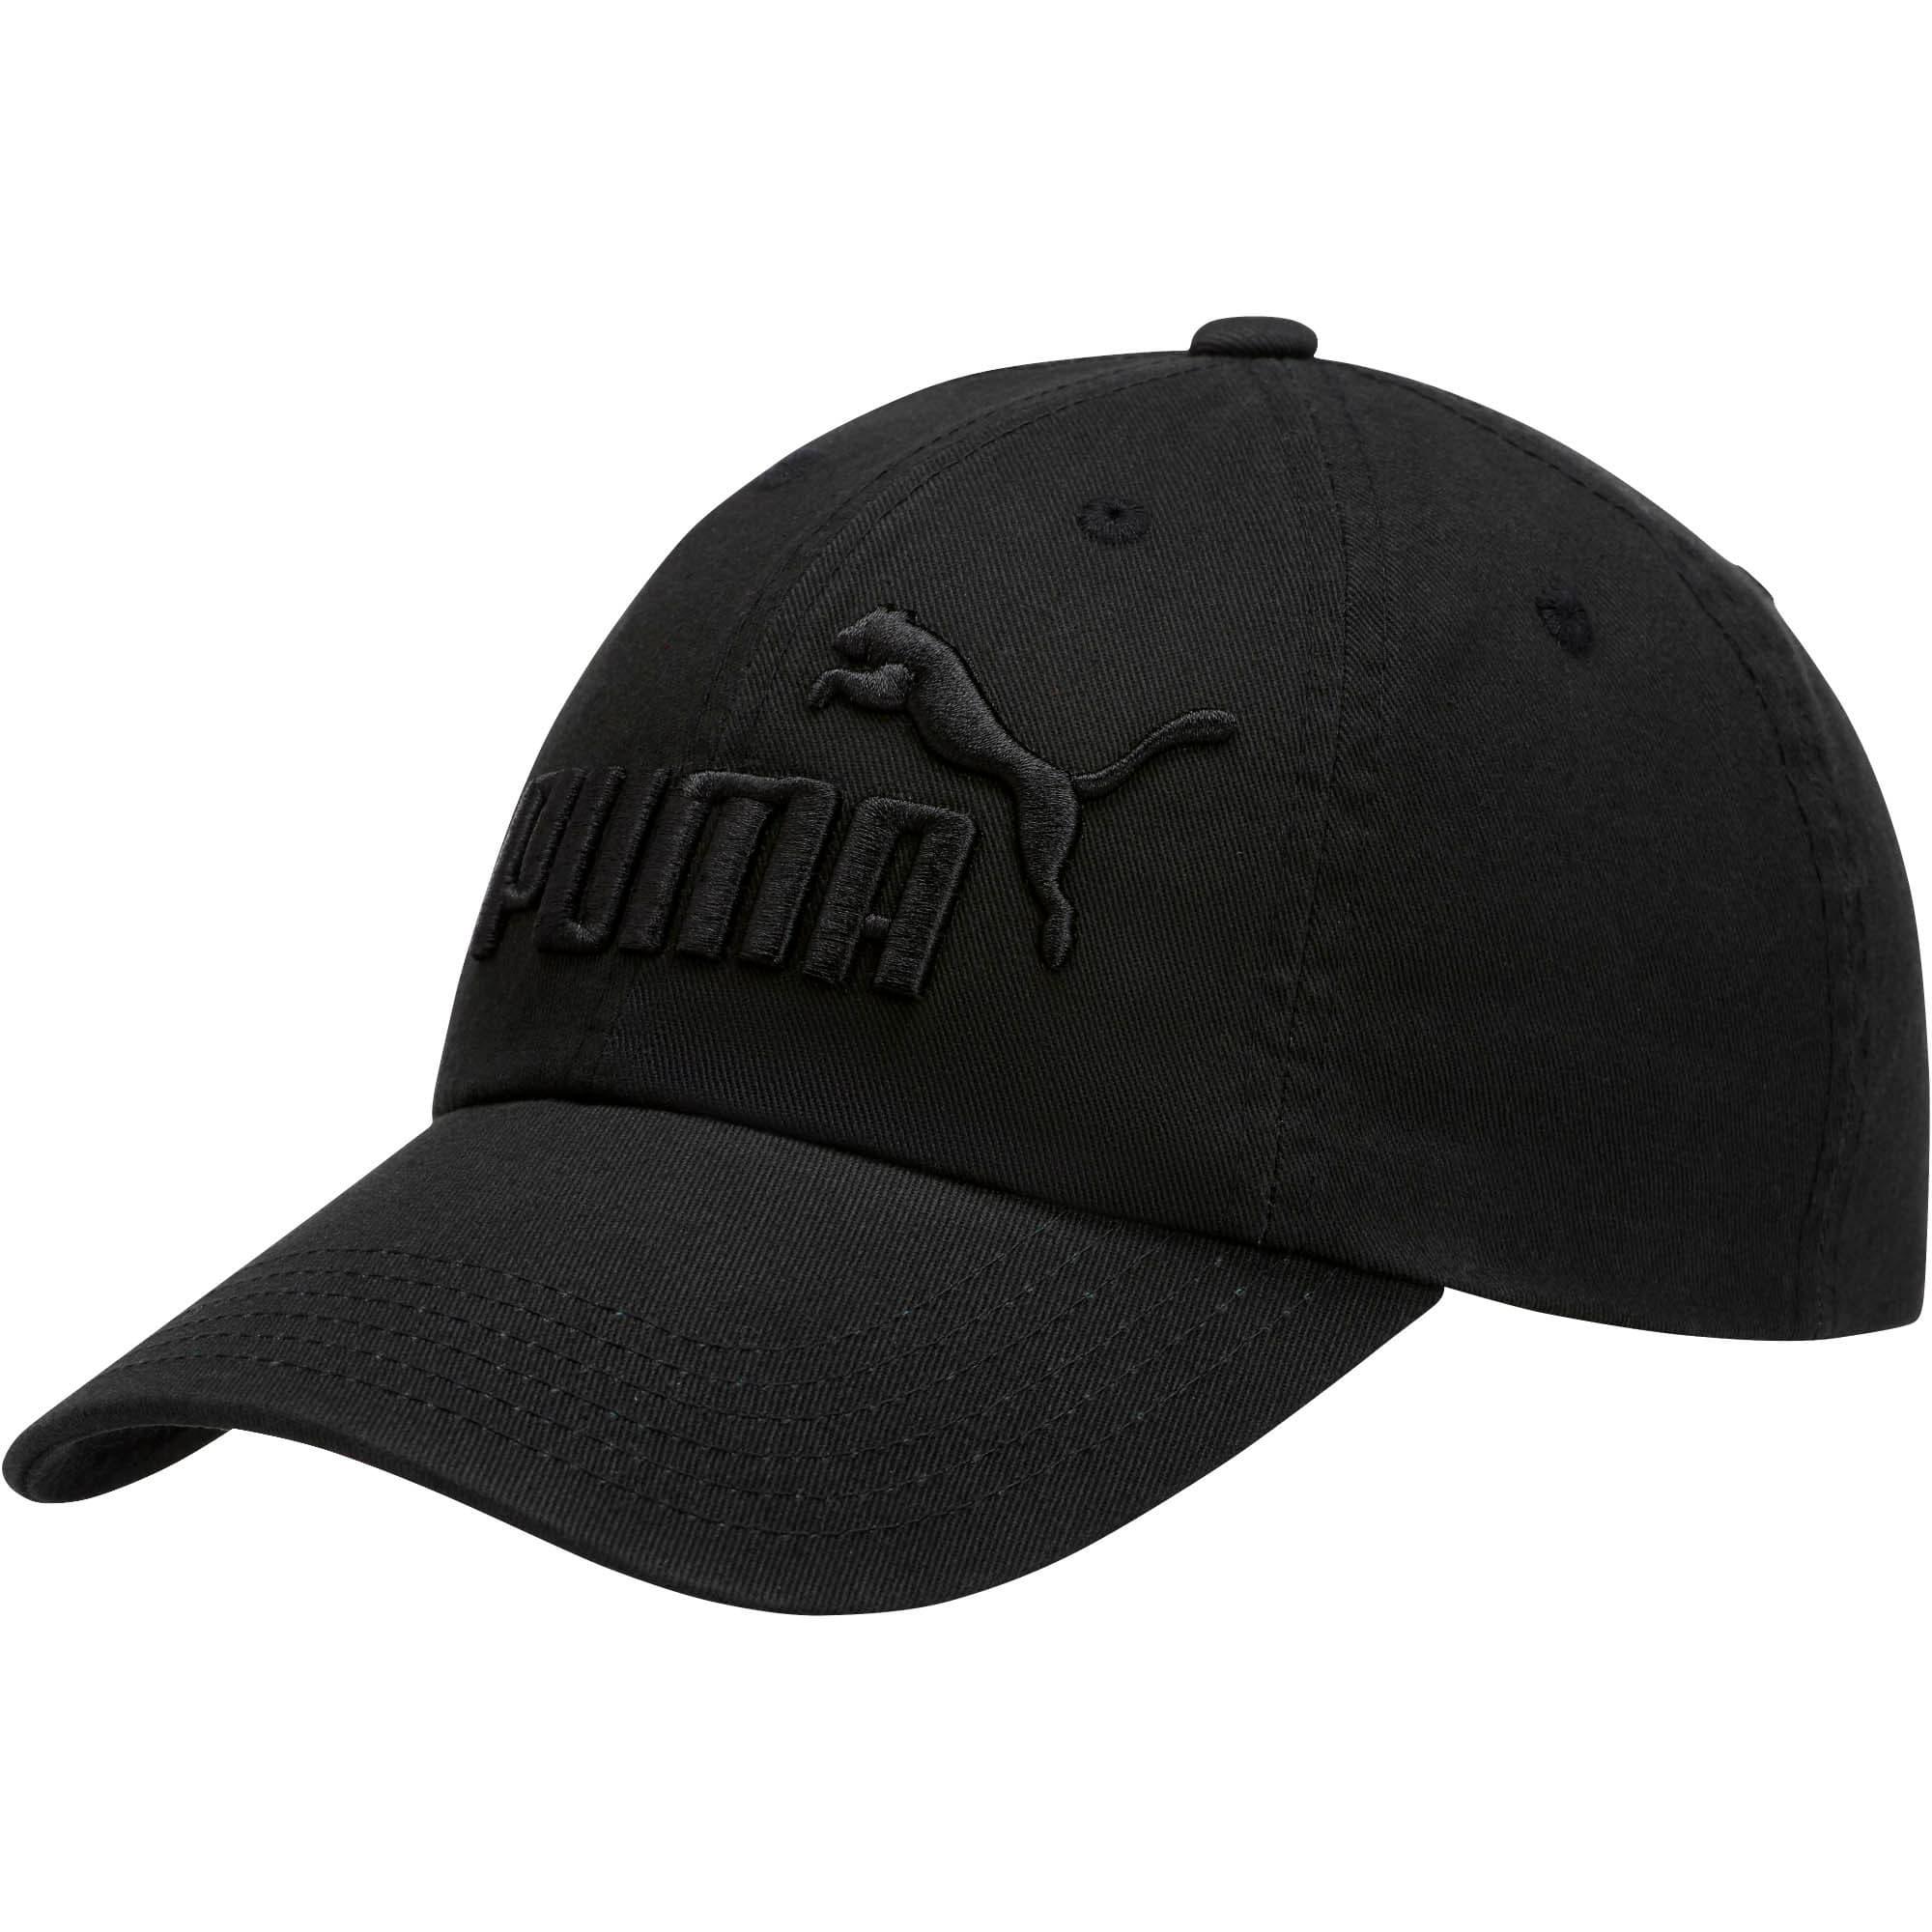 Thumbnail 1 of PUMA #1 Relaxed Fit Adjustable Hat, Black, medium